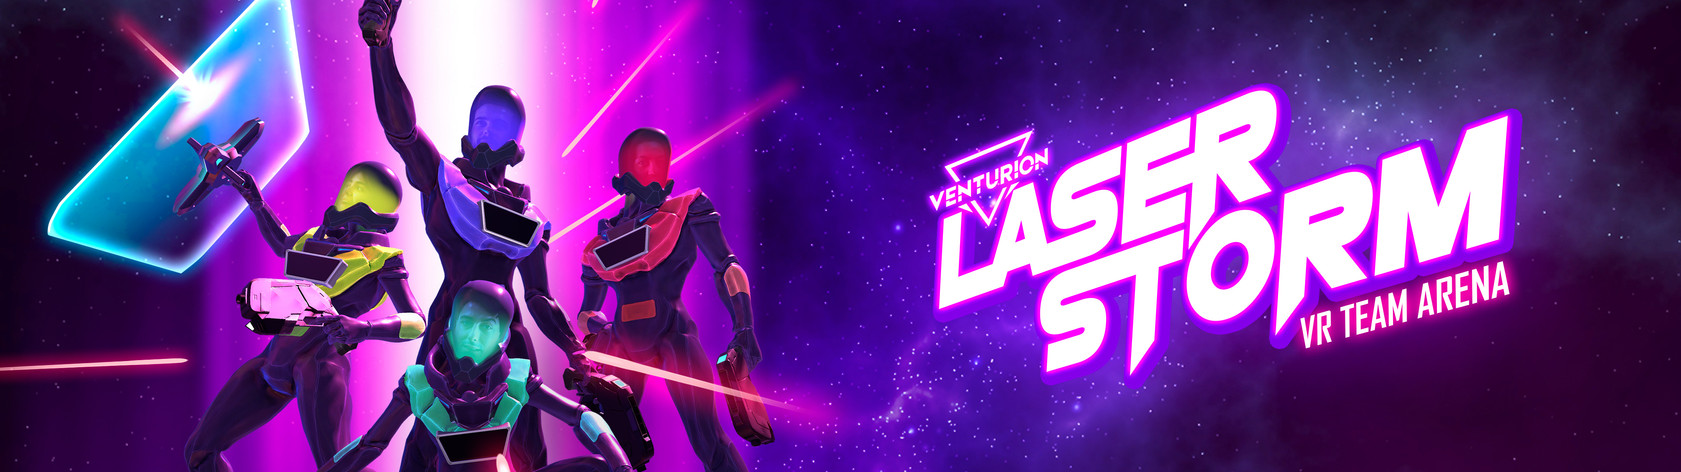 LSA_Sidequest_banner.jpg